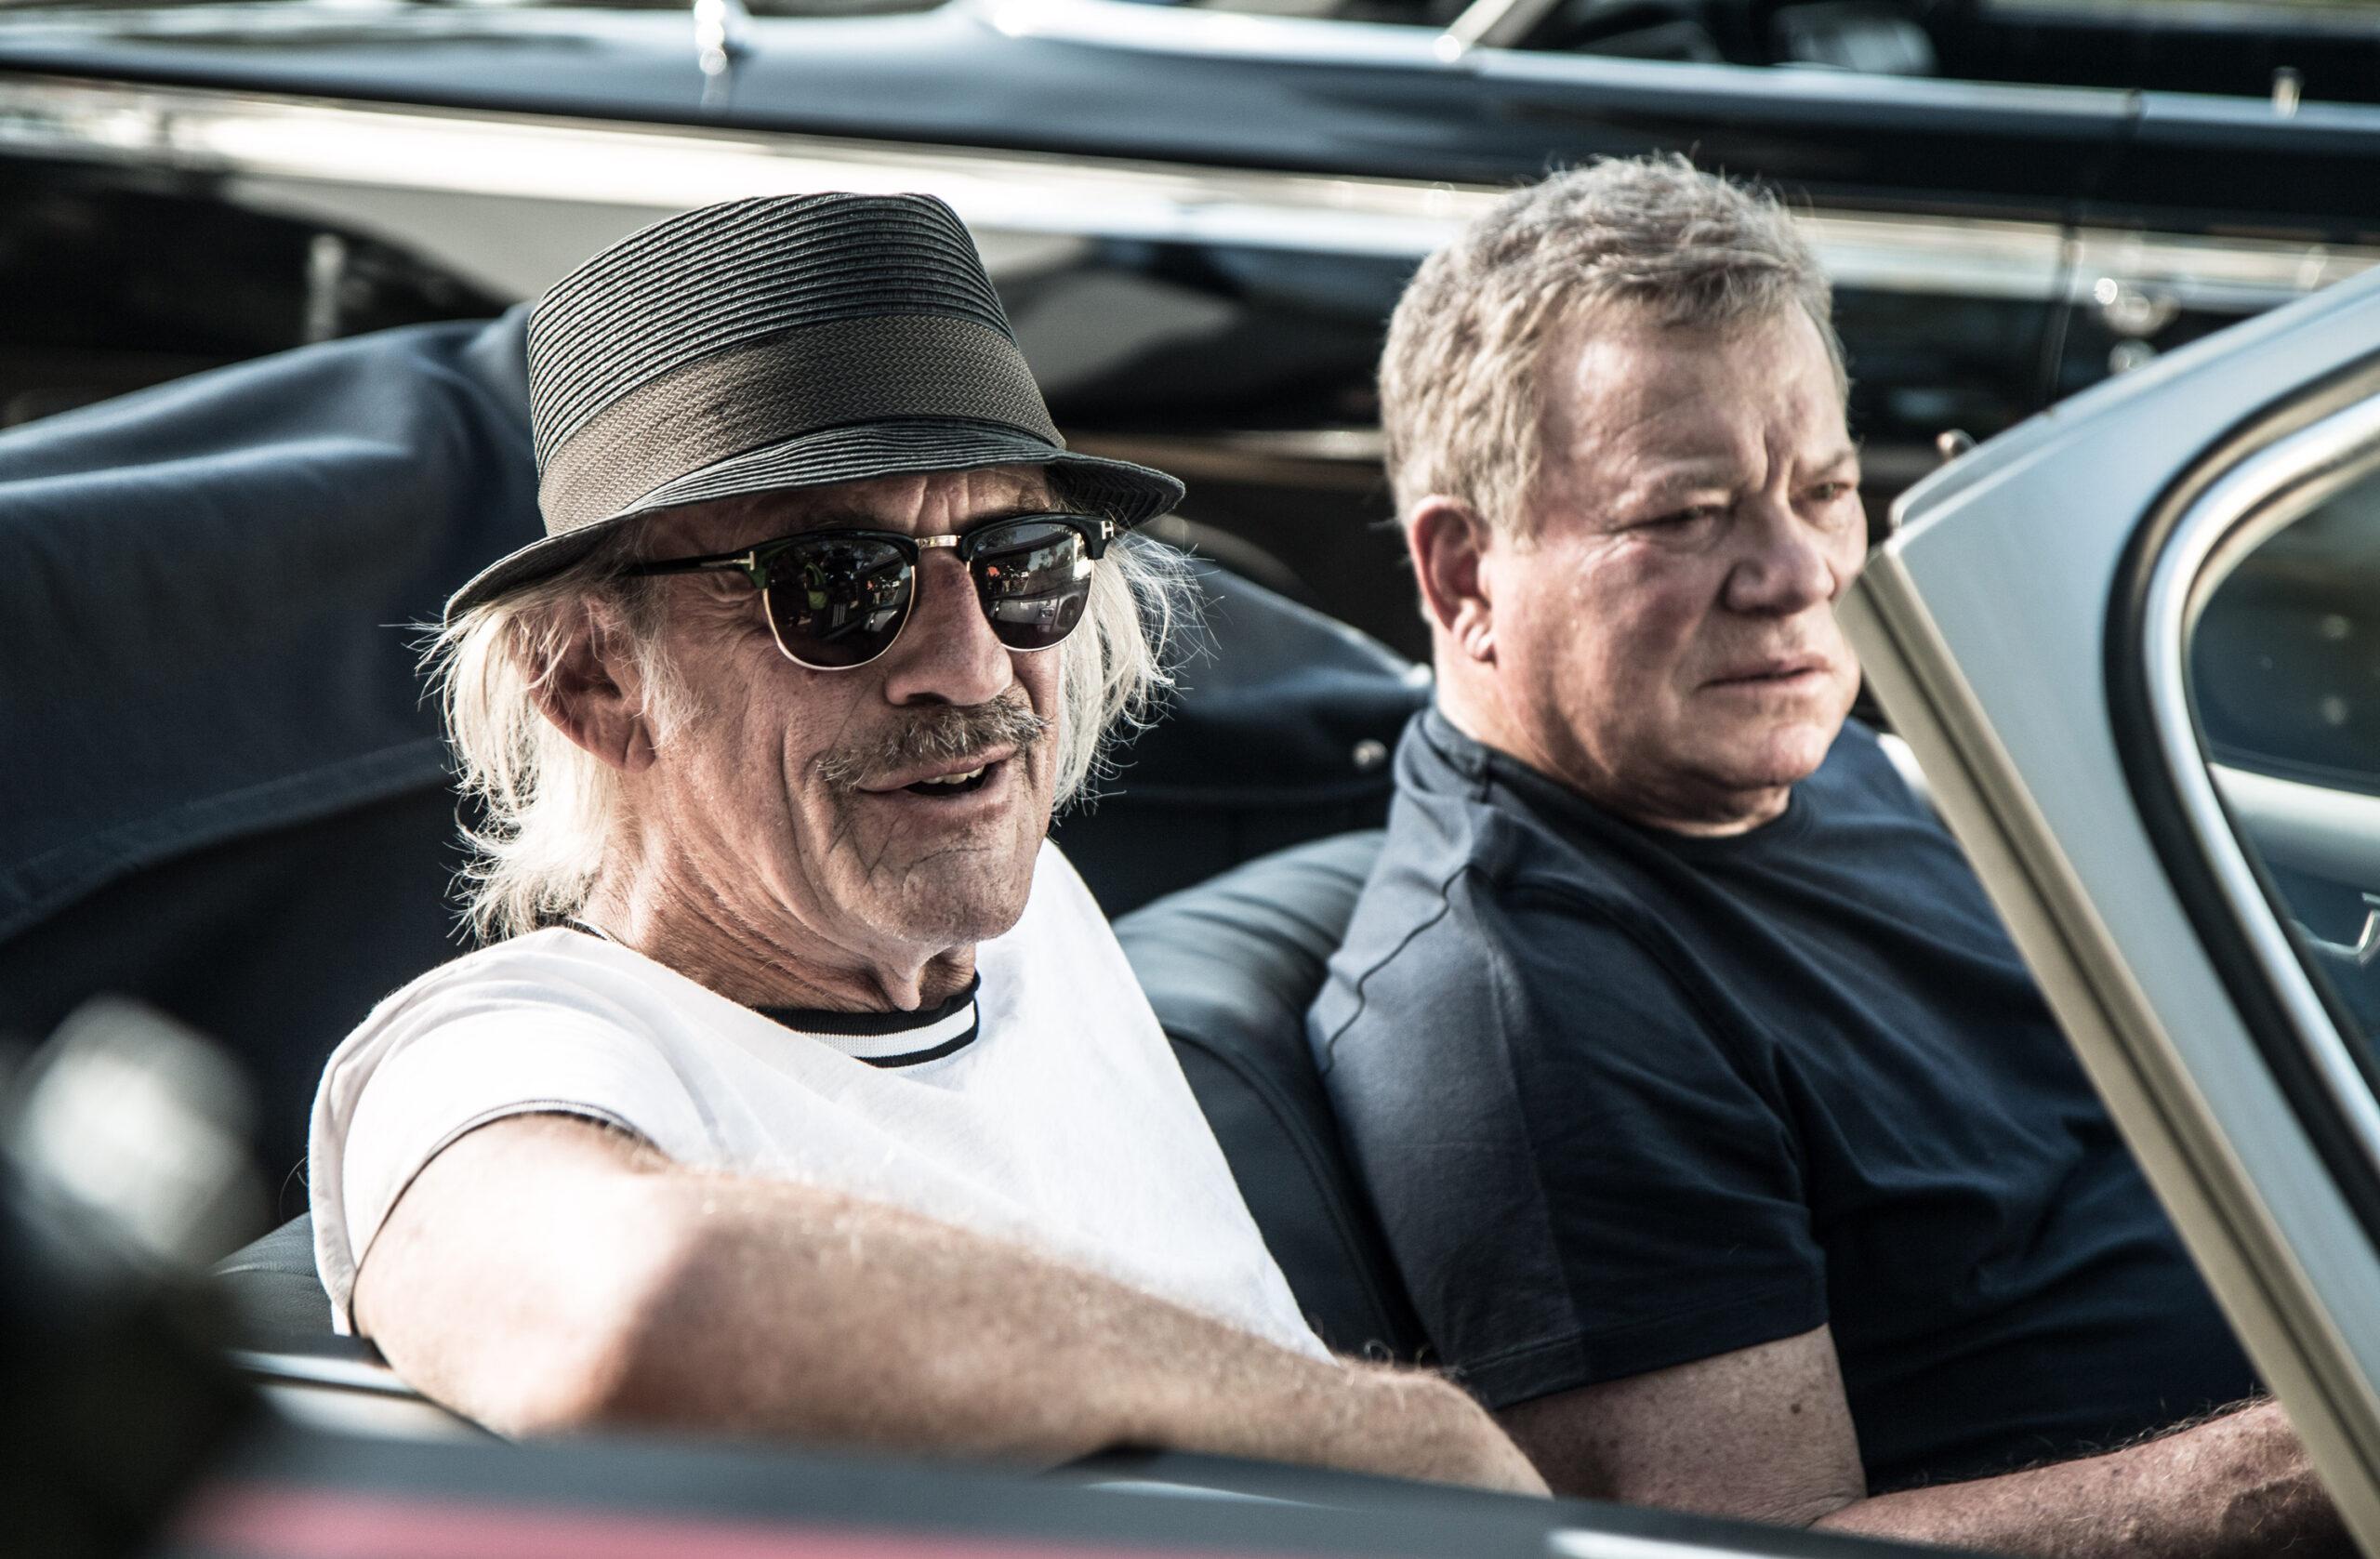 """Senior Moment"" Interviews with William Shatner, Director Giorgio Serafini"